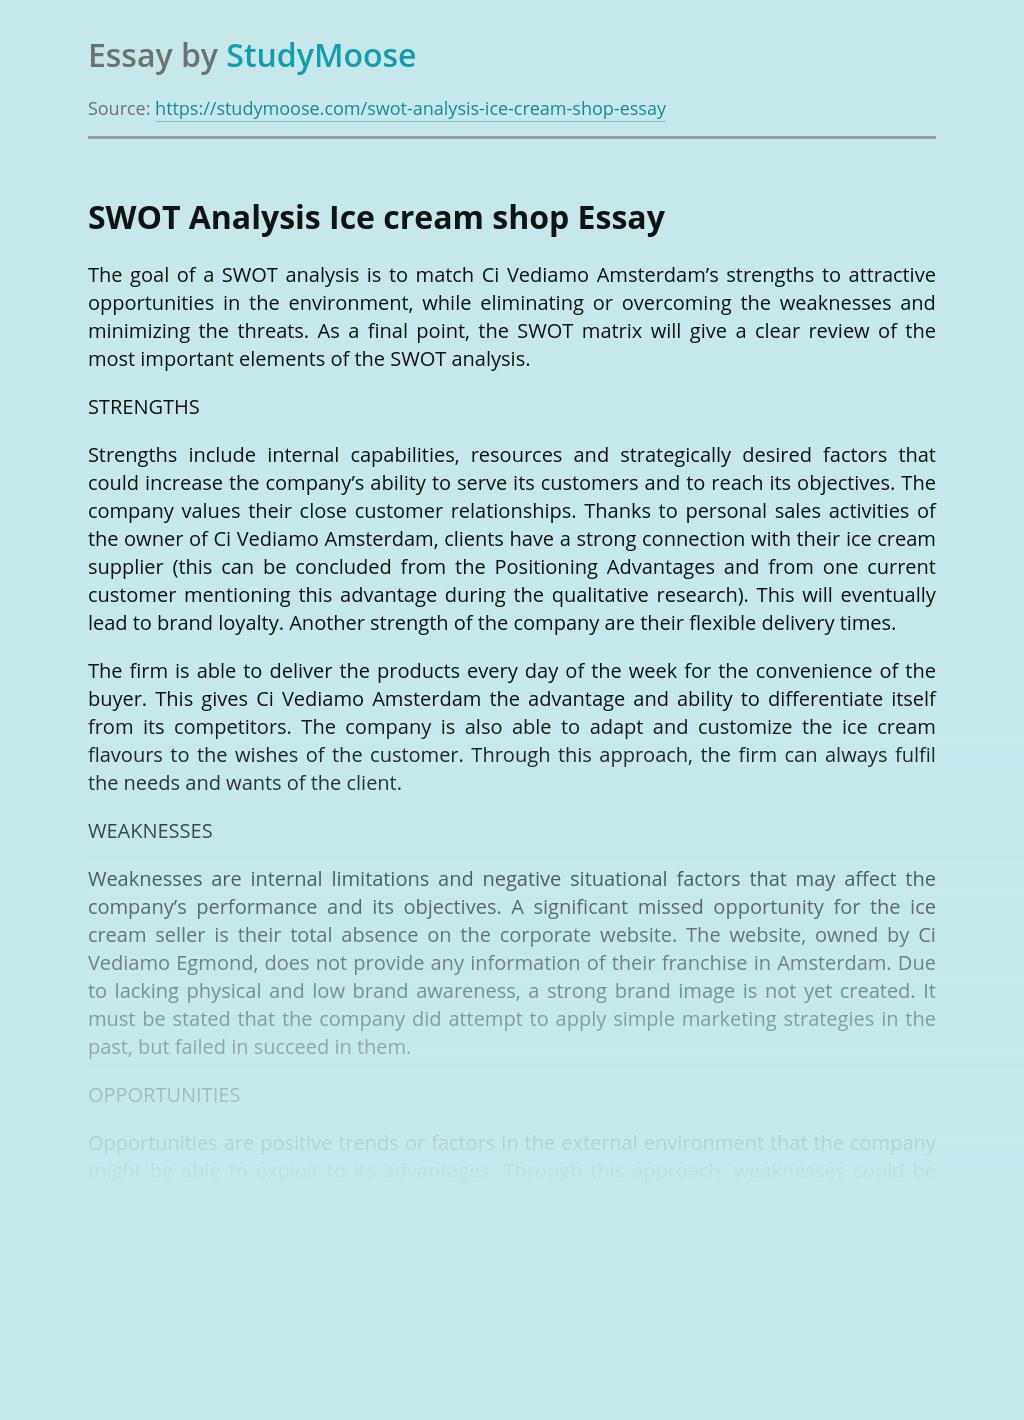 SWOT Analysis Ice cream shop